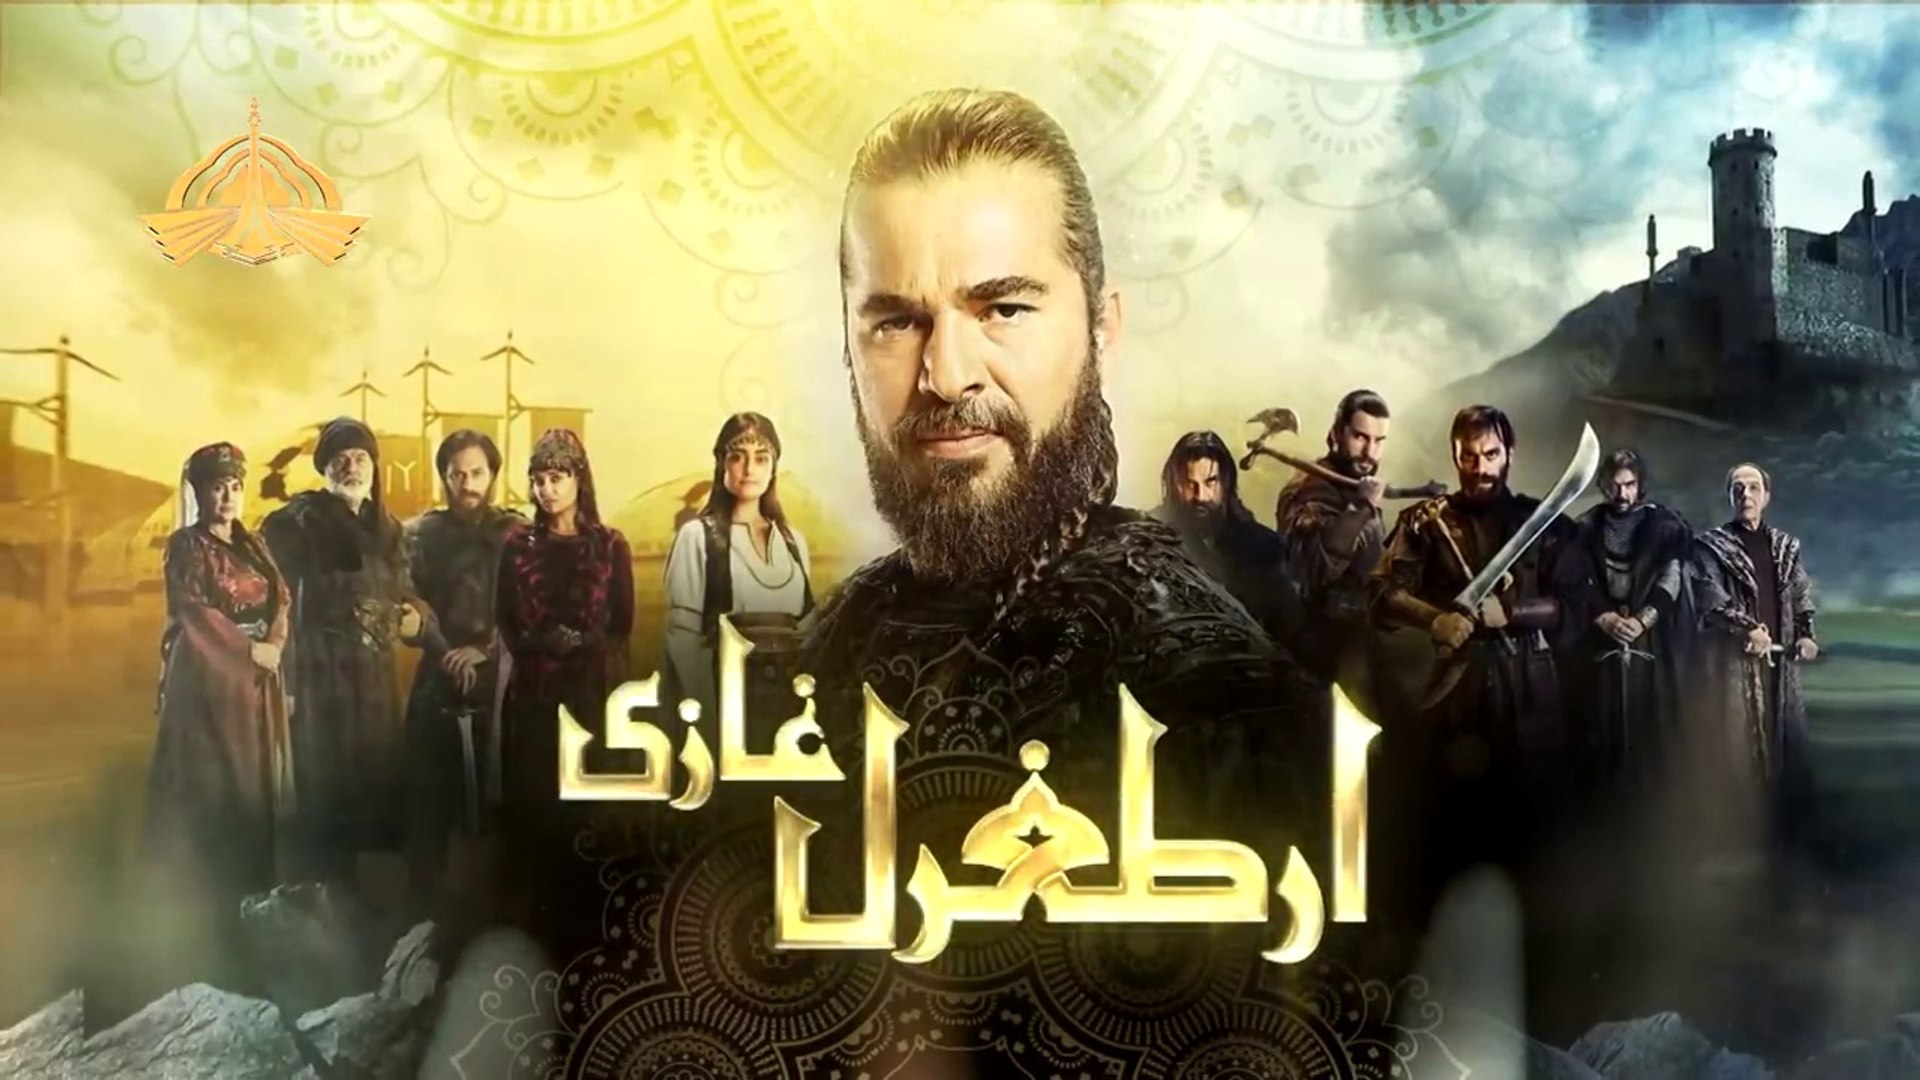 Ertugrul Ghazi Season 1 Episode 2 In Urdu/Hindi Dubbed HD - video dailymotion